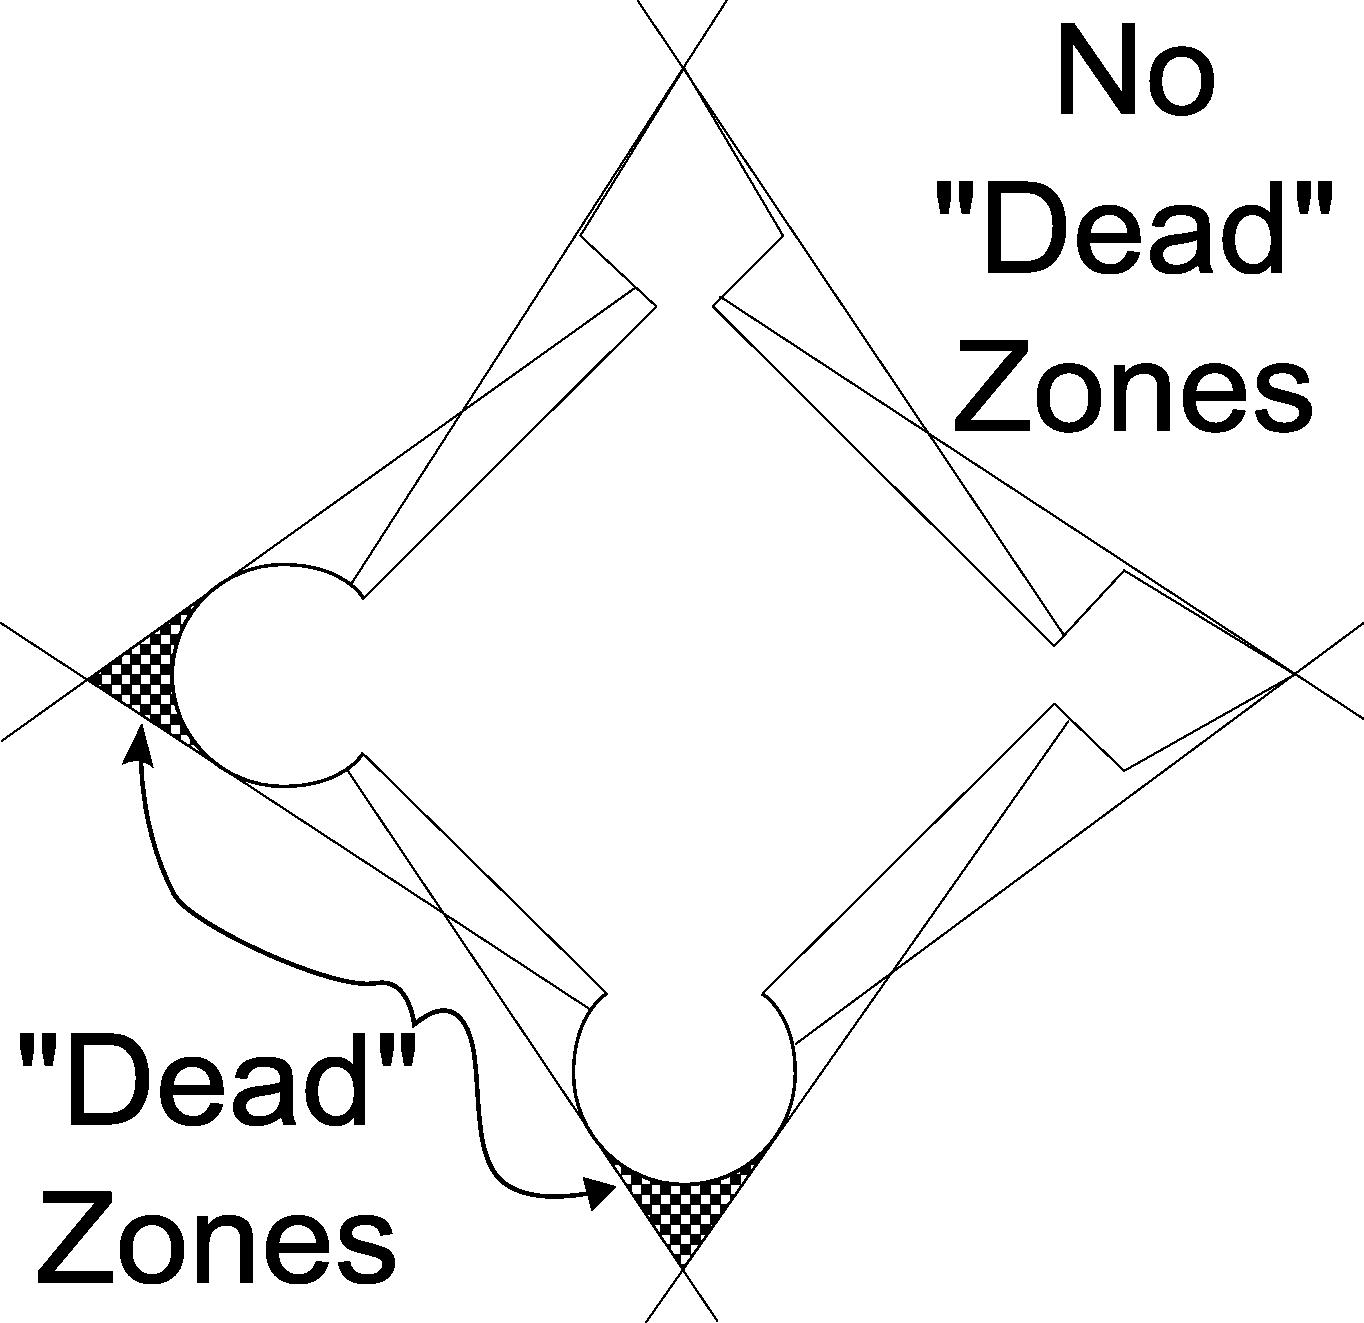 Filestarfortdeadzonesg wikipedia filestarfortdeadzonesg ccuart Gallery